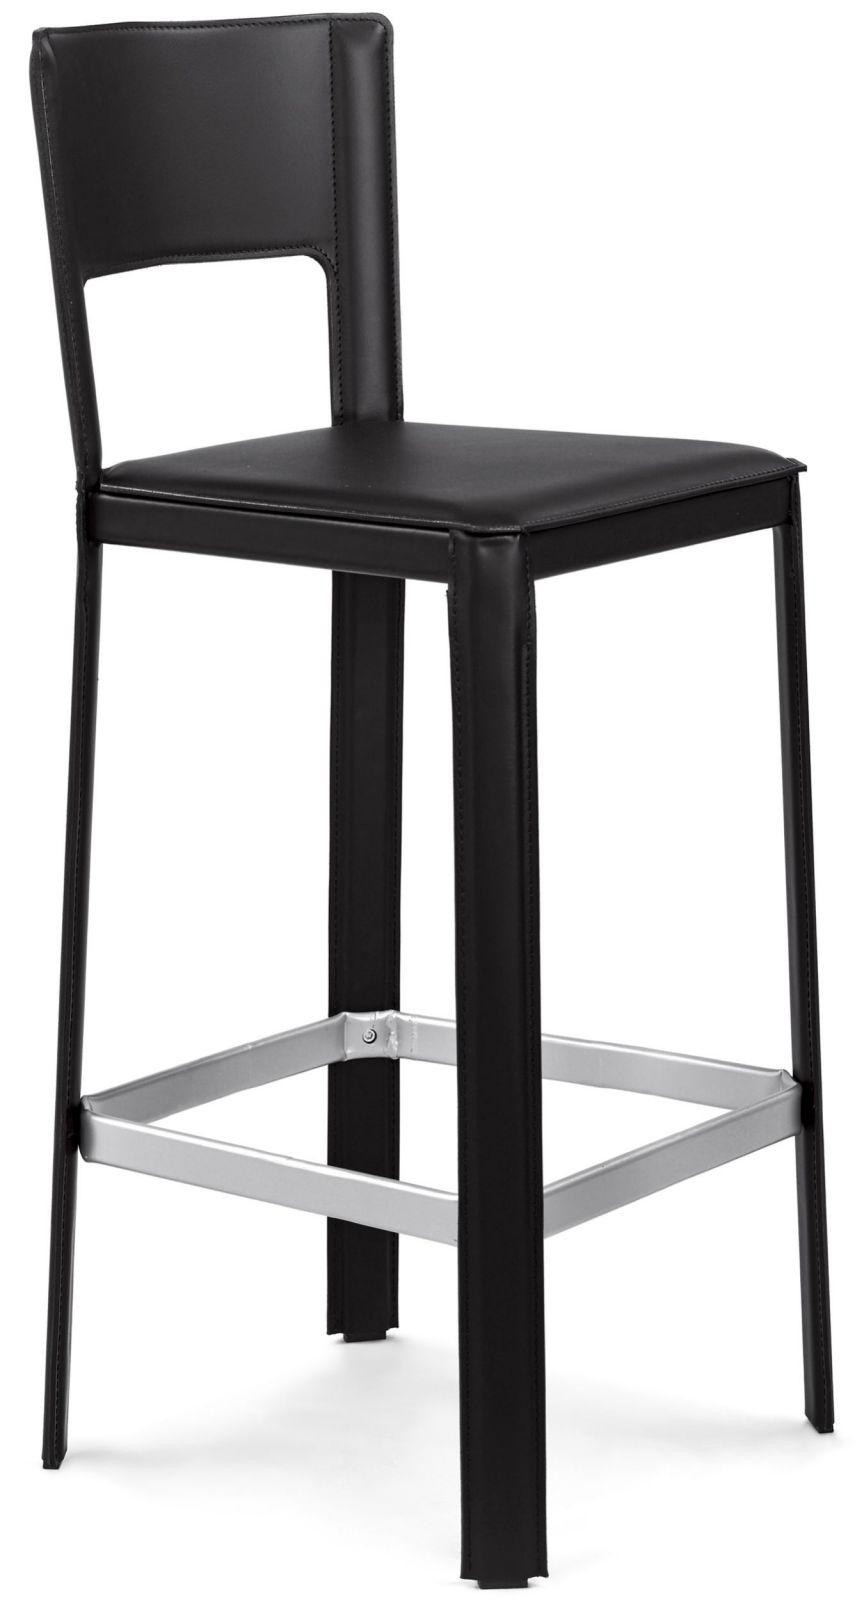 modern-bar-stools-Italian-furniture-large (15).jpg